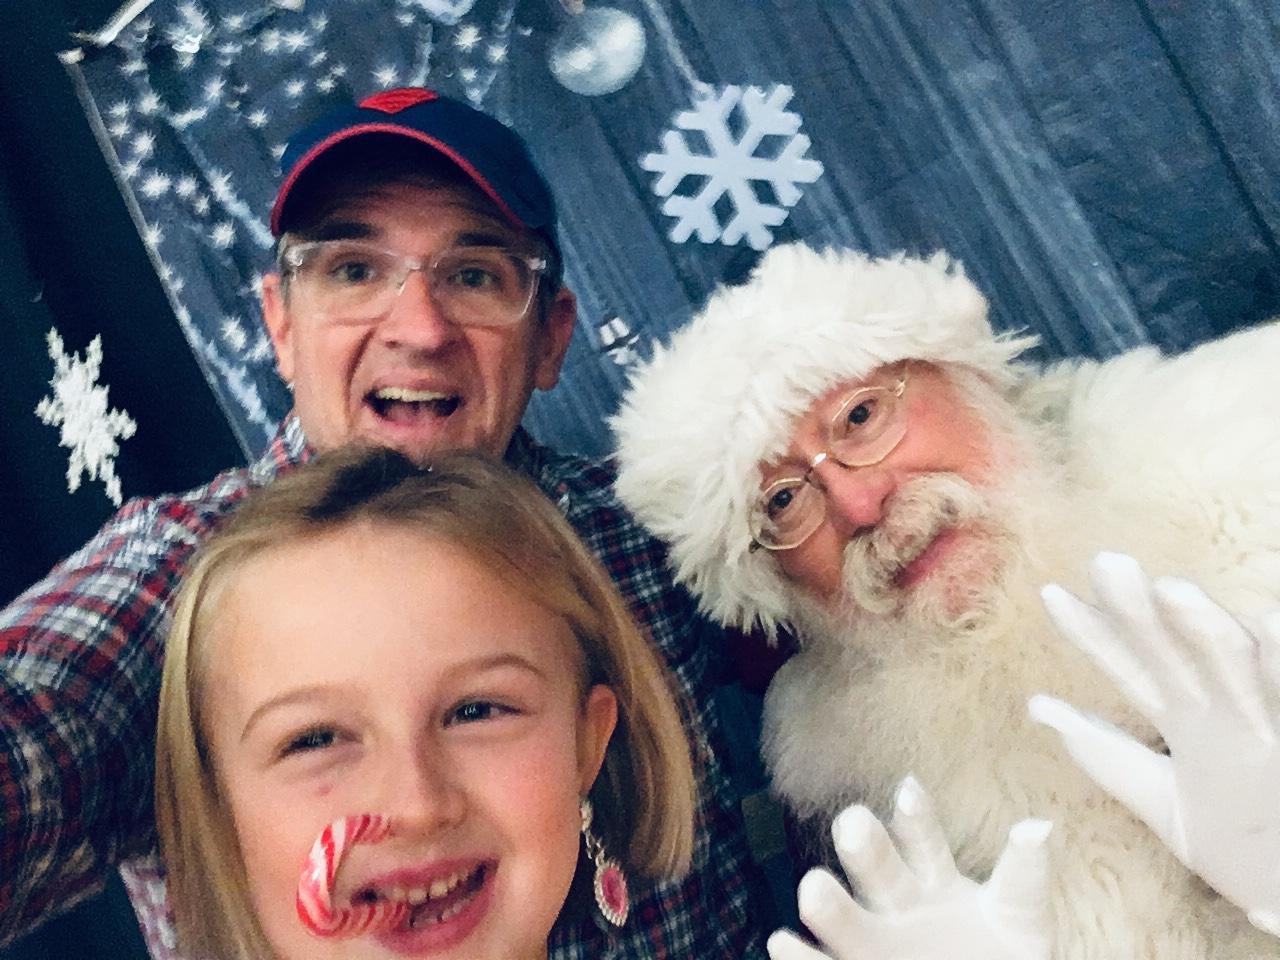 Mr. B., Eden Jane, and Santa